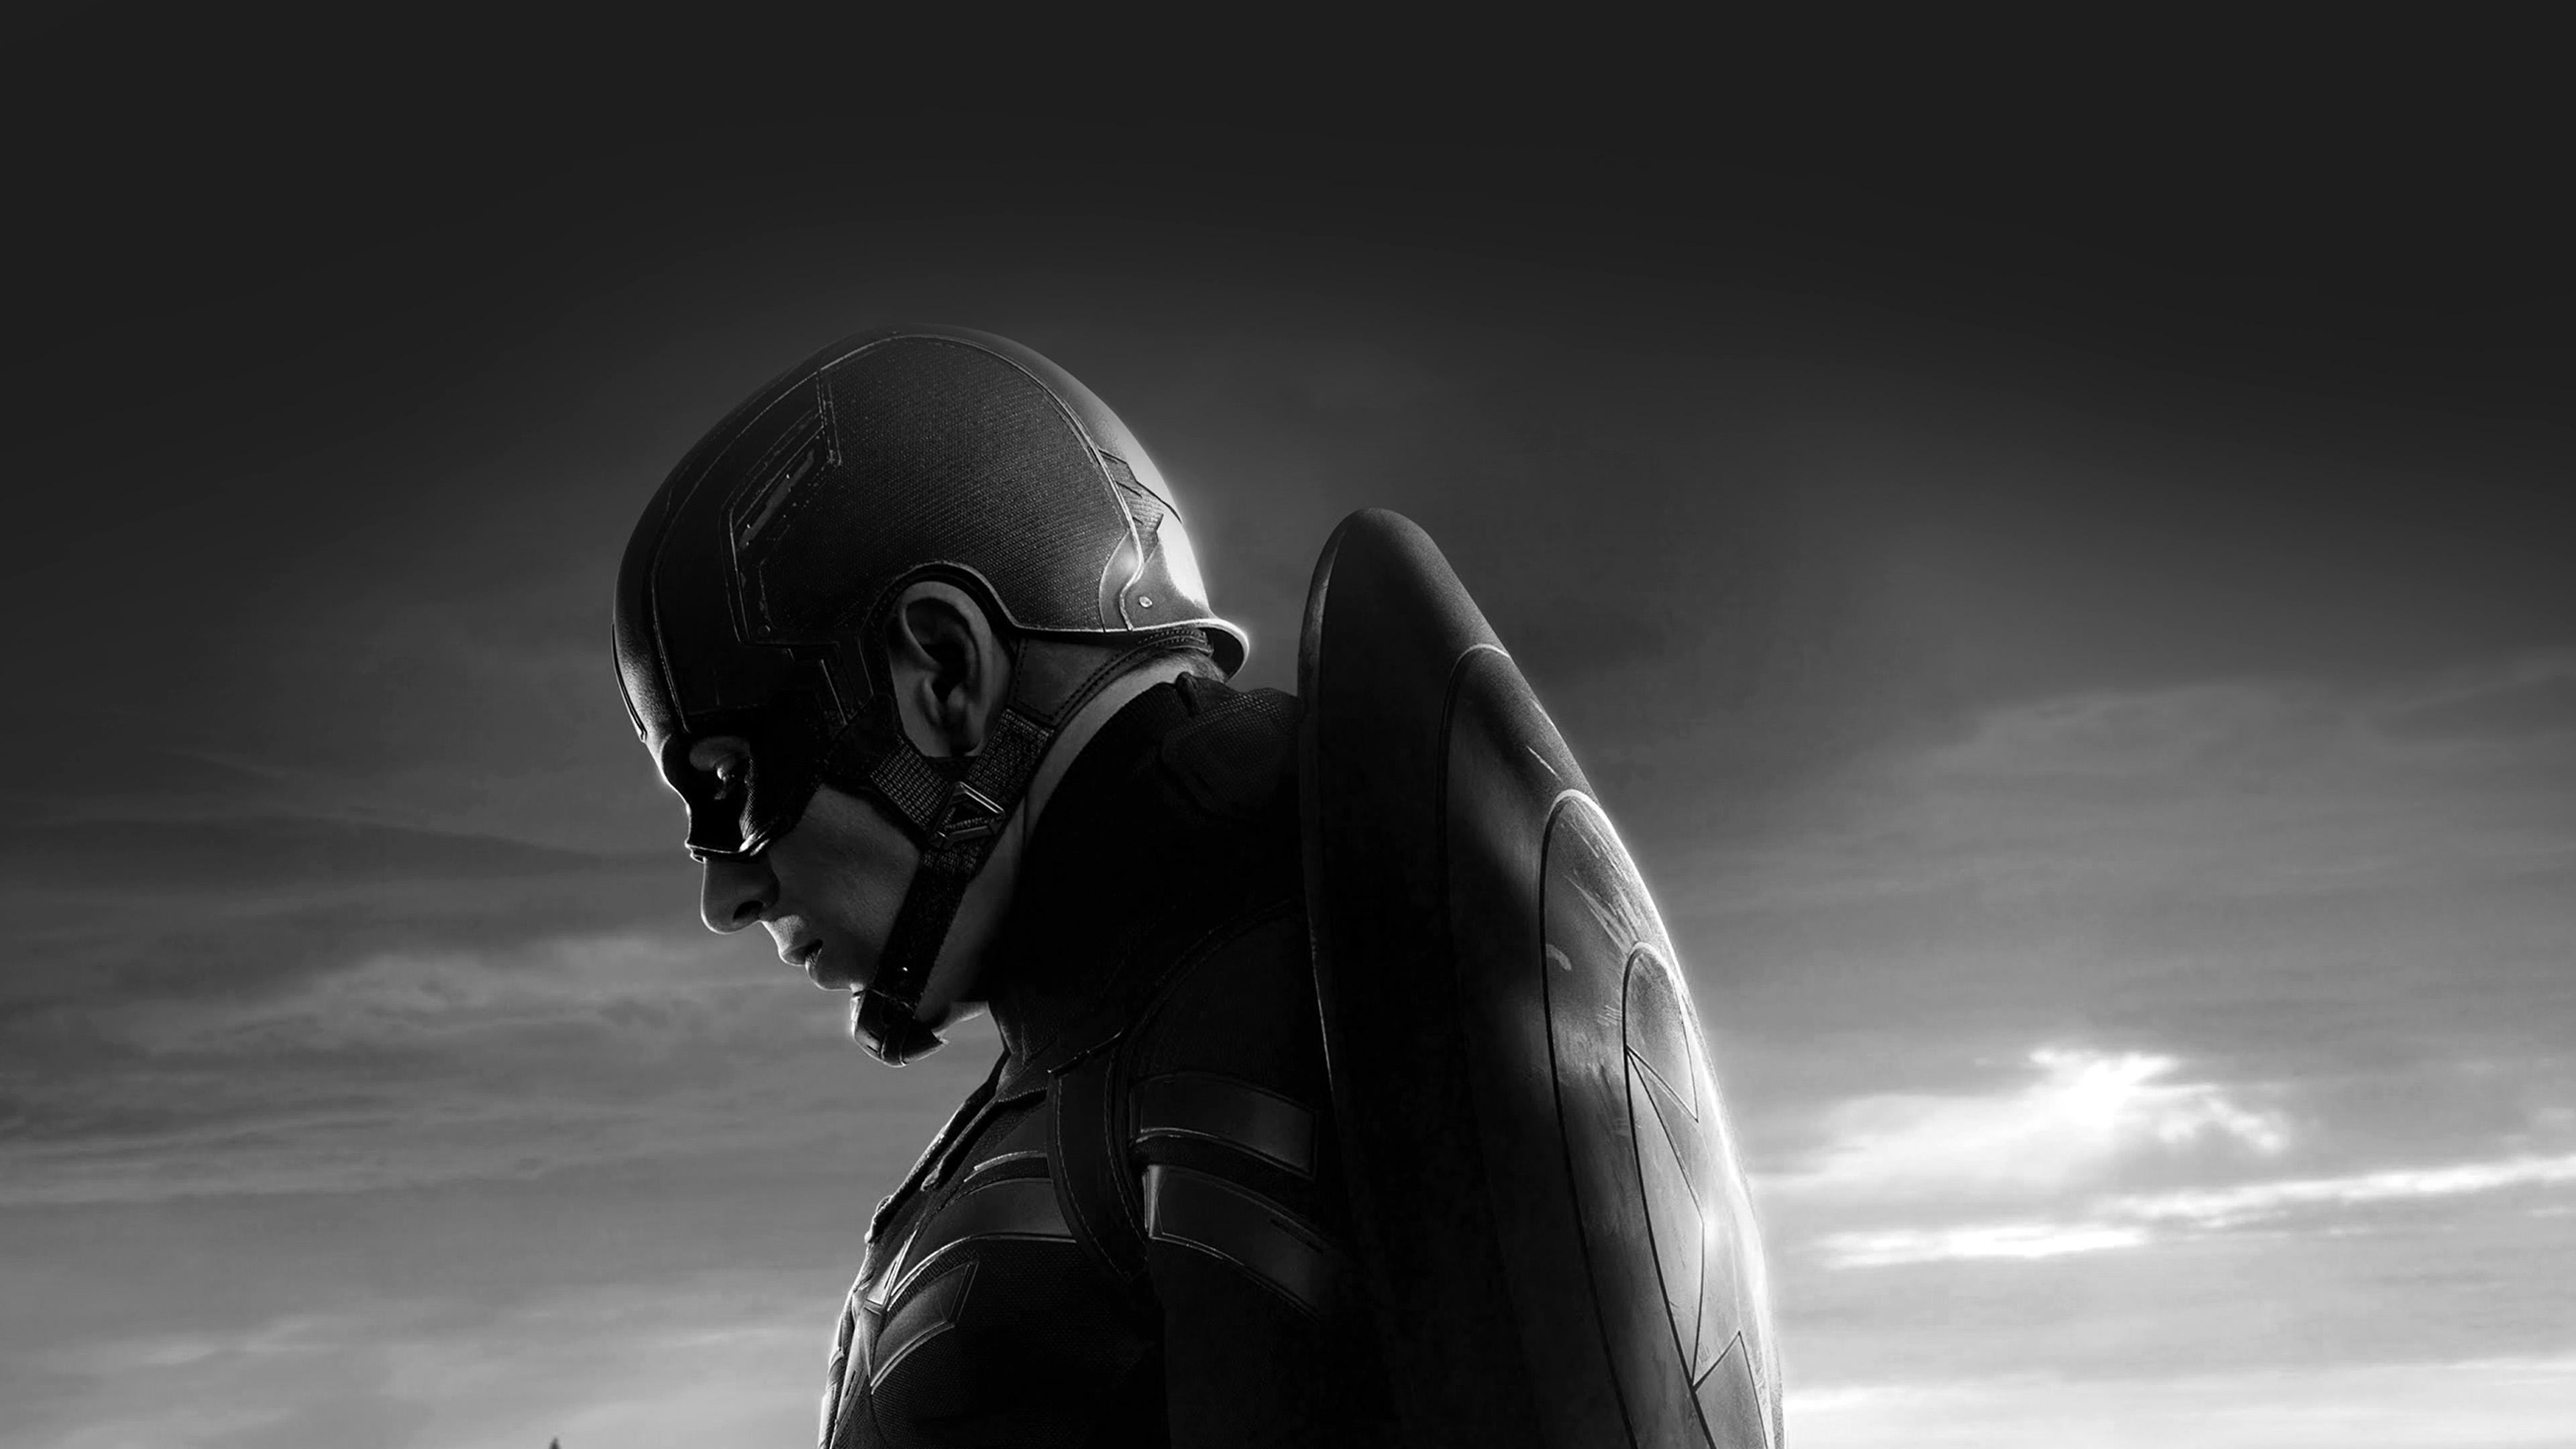 An85 Captain America Sad Hero Film Marvel Dark Bw Wallpaper